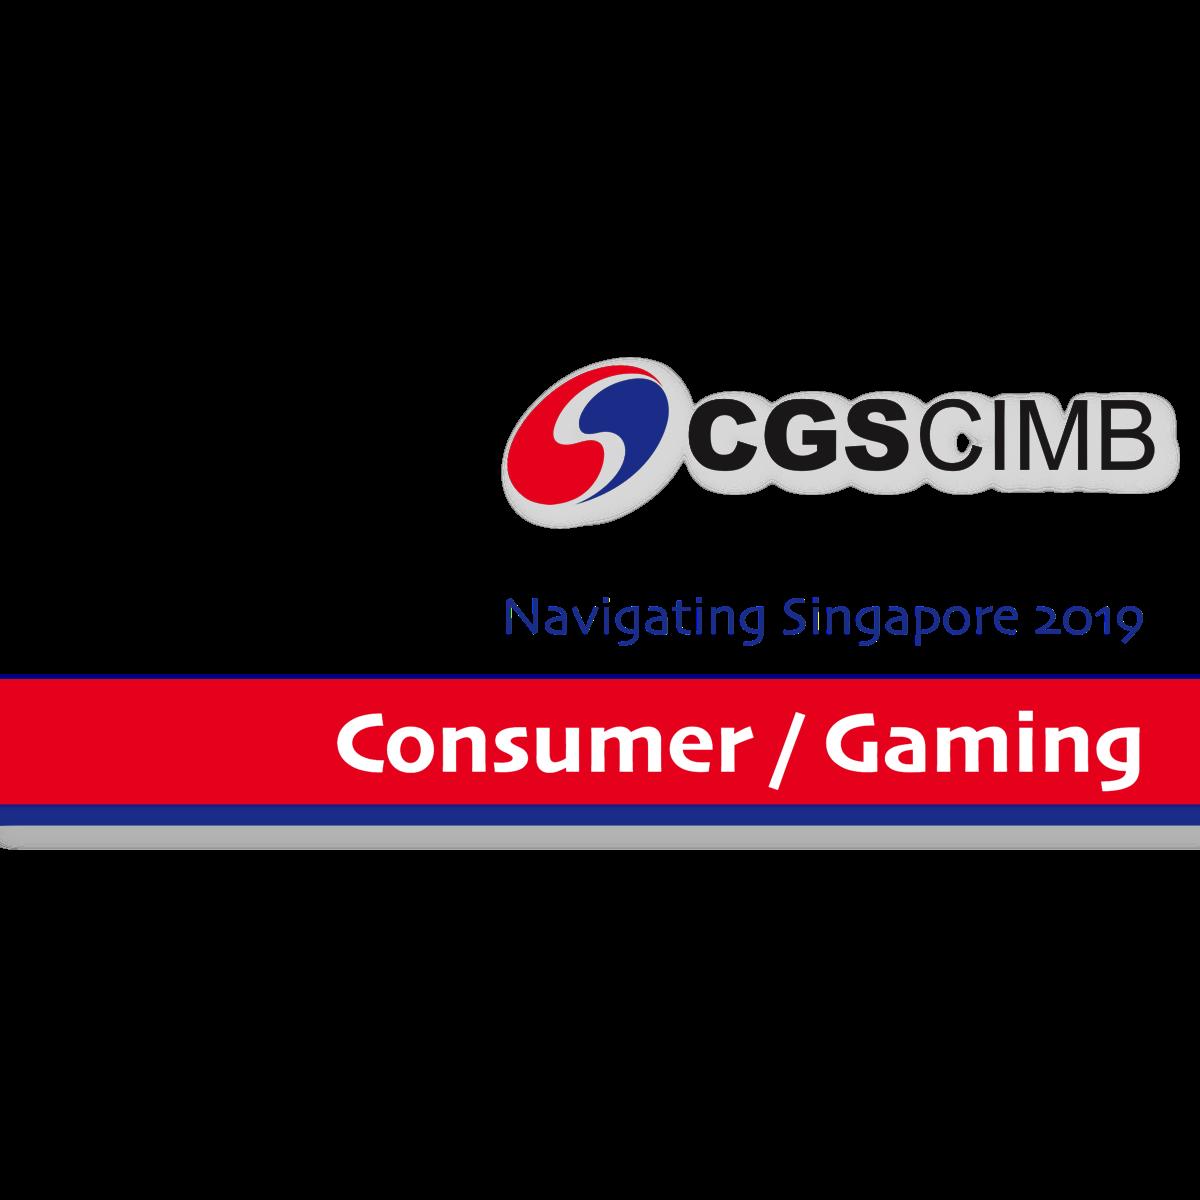 Navigate Singapore 2019 ~ Consumer/Gaming - CGS-CIMB Research | SGinvestors.io